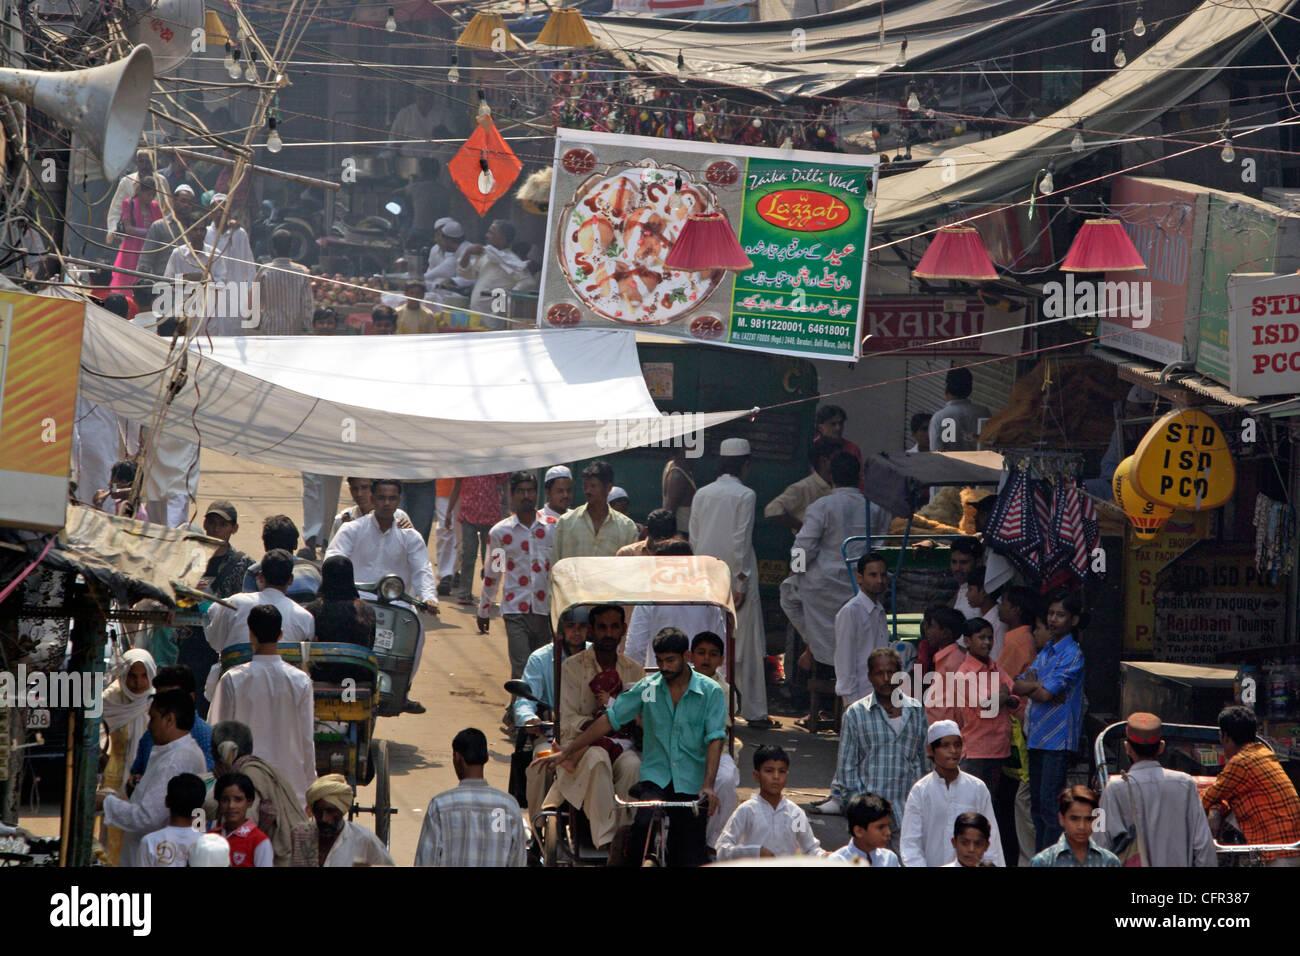 Calles de Nueva Delhi. India. Stock Photo